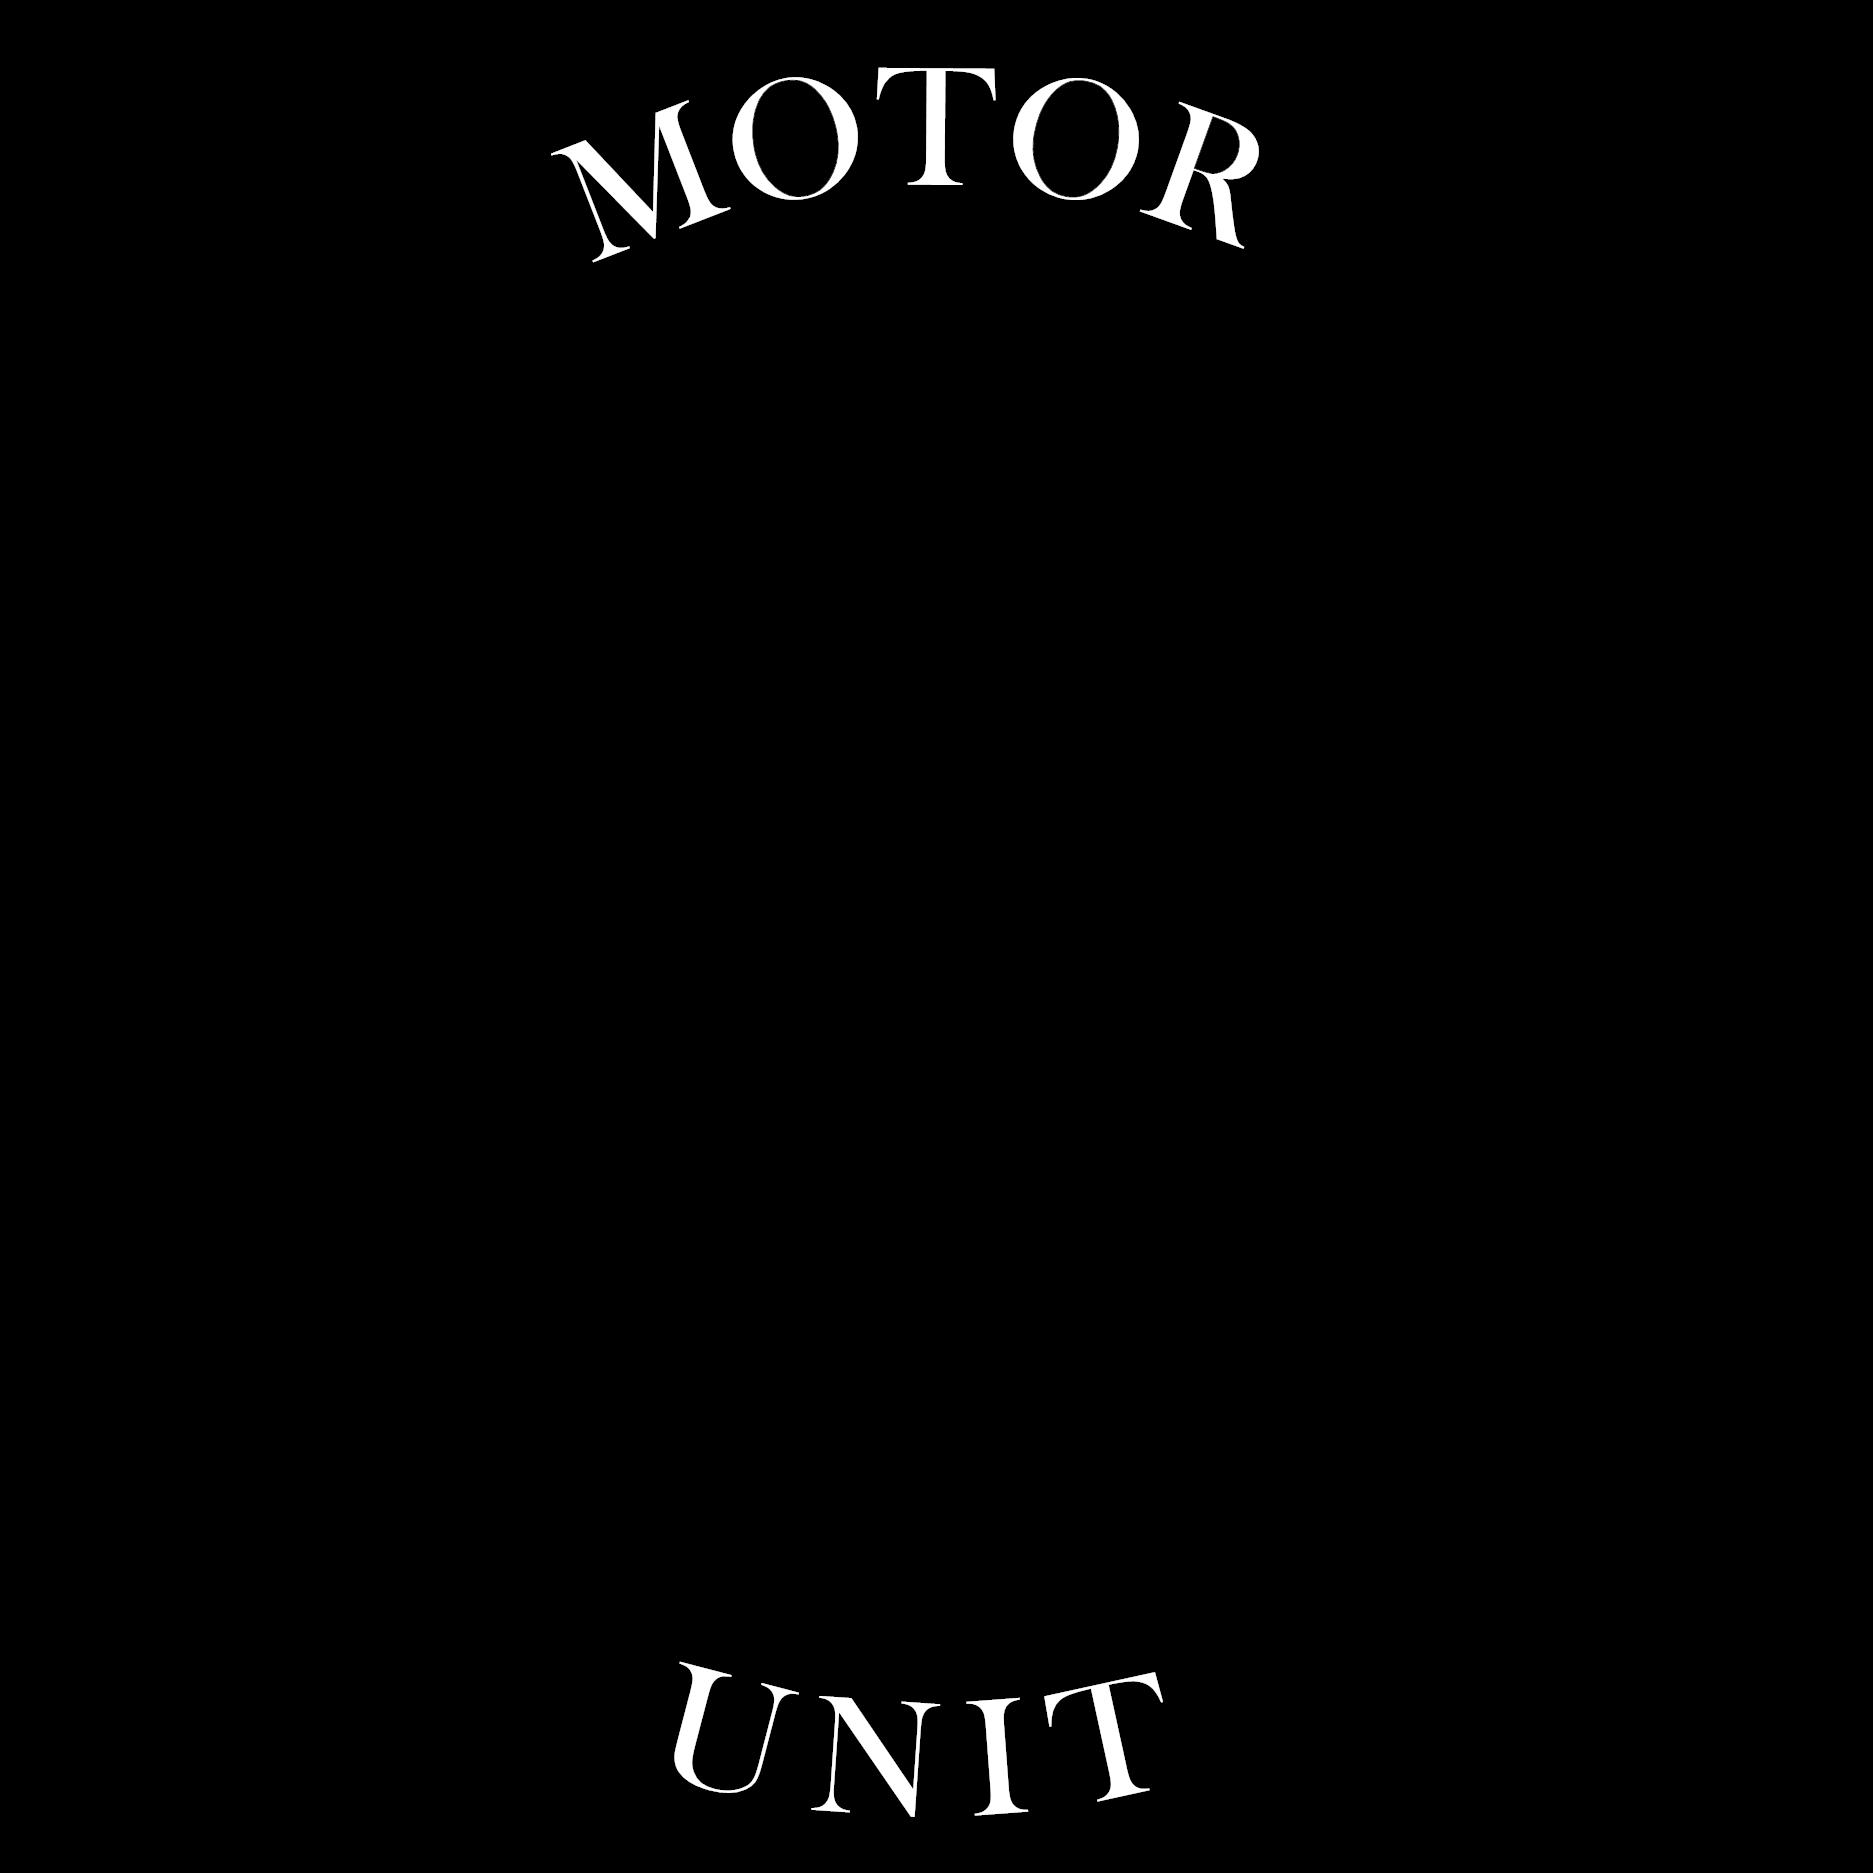 motor-unit.png